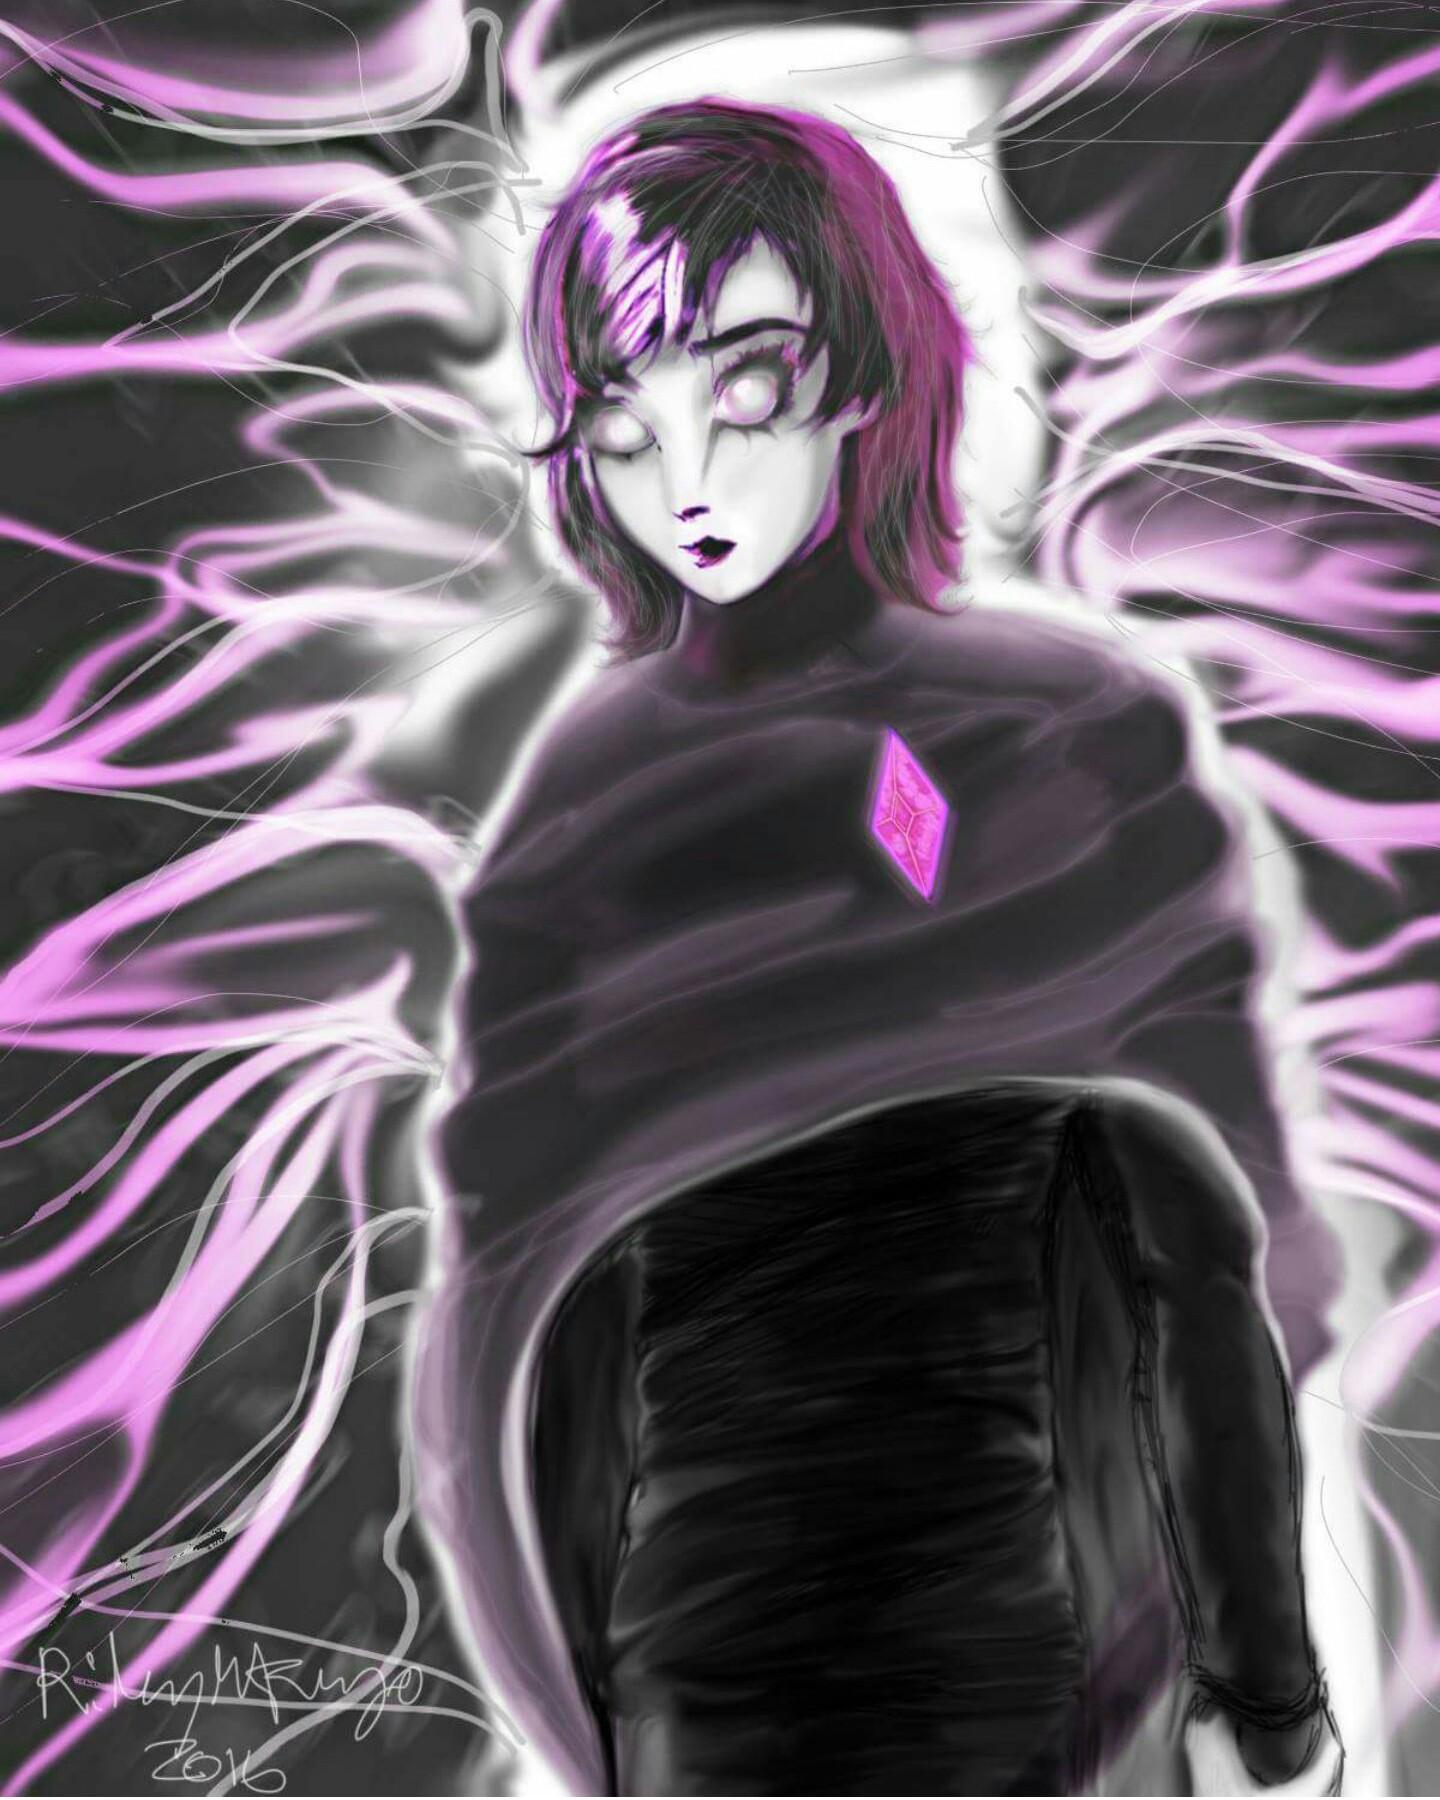 Psychadica - Vairra the Crystalline Girl